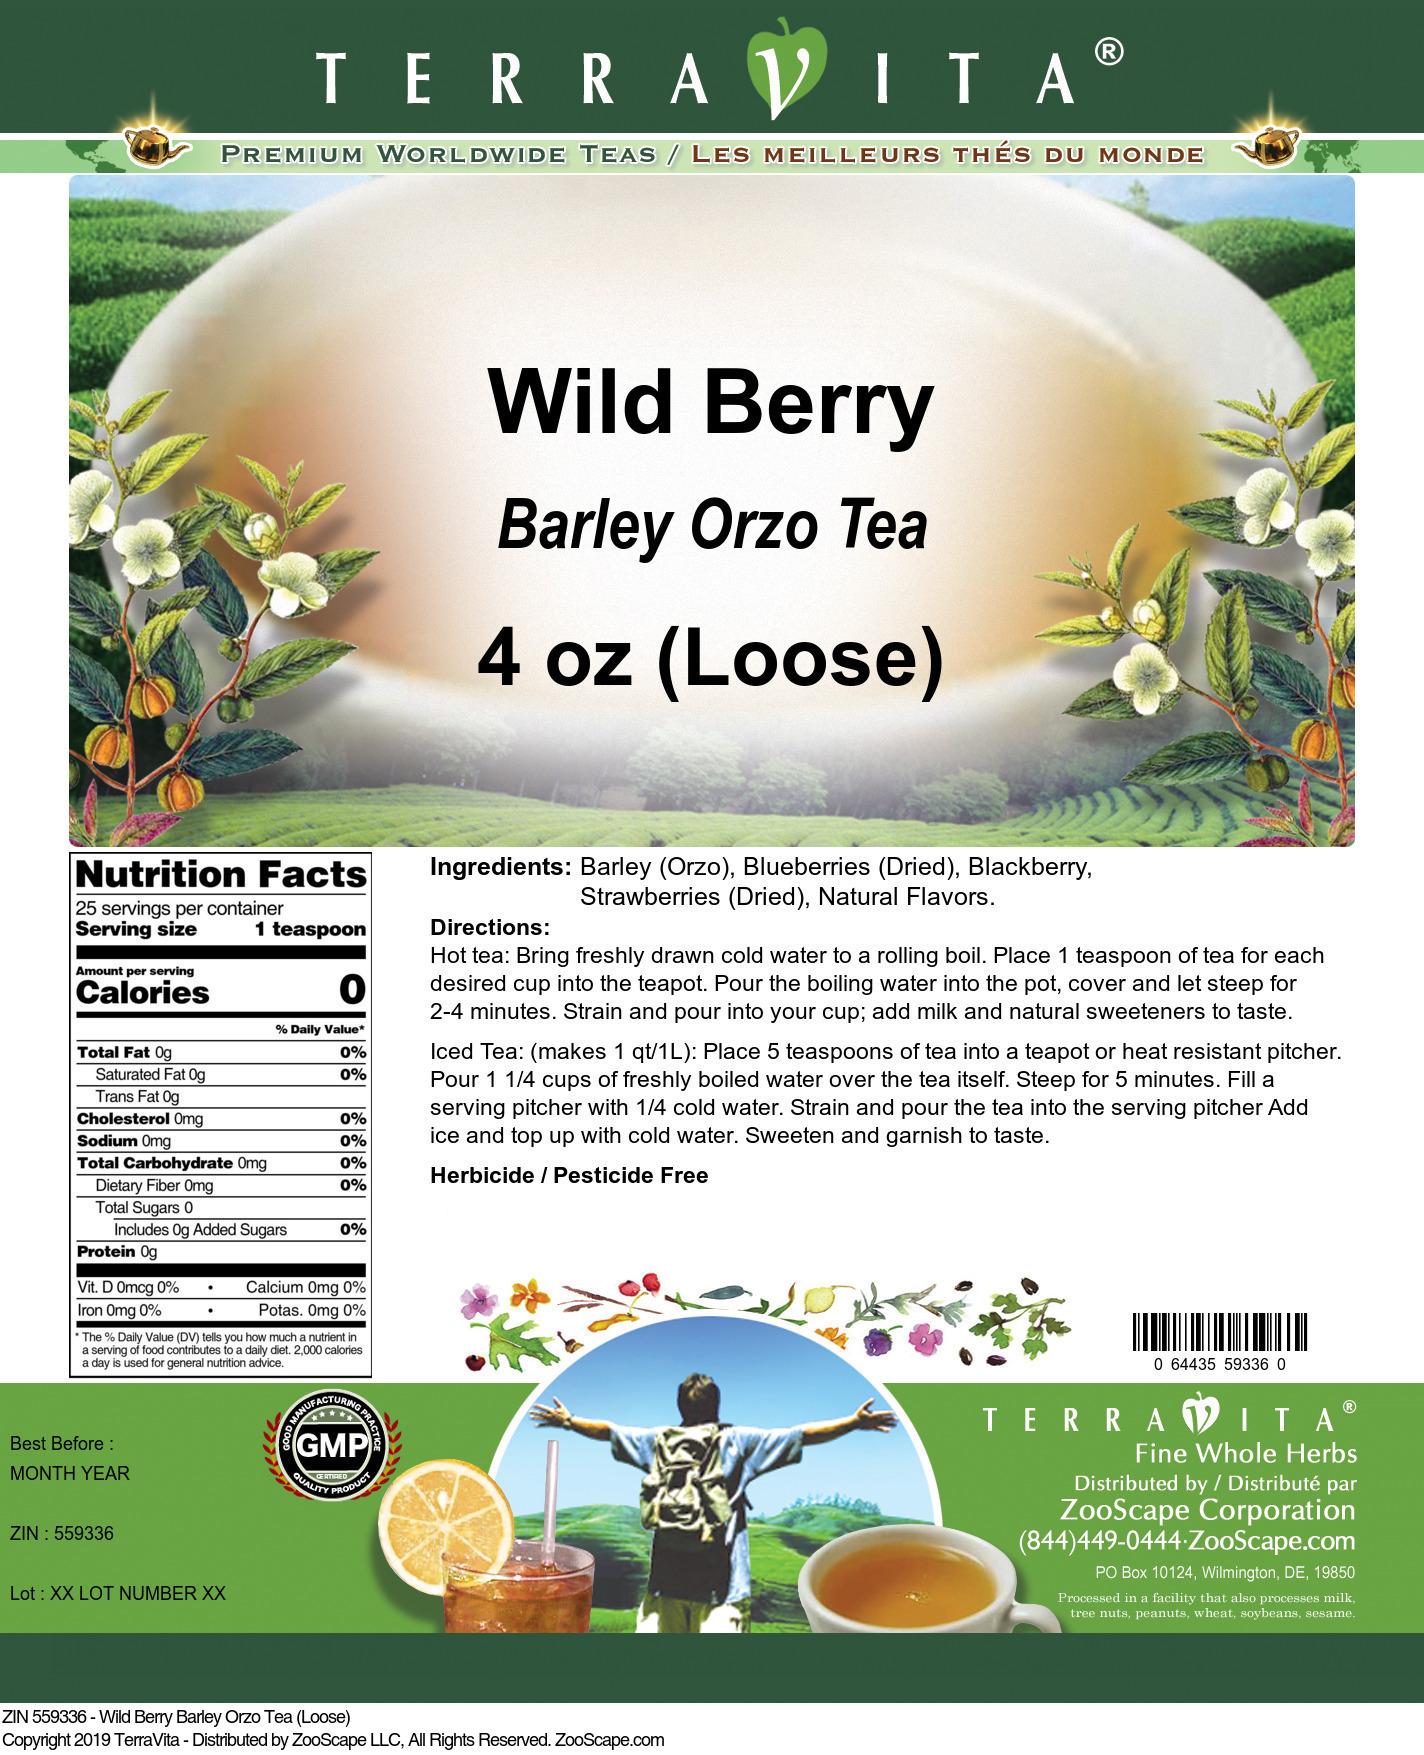 Wild Berry Barley Orzo Tea (Loose)